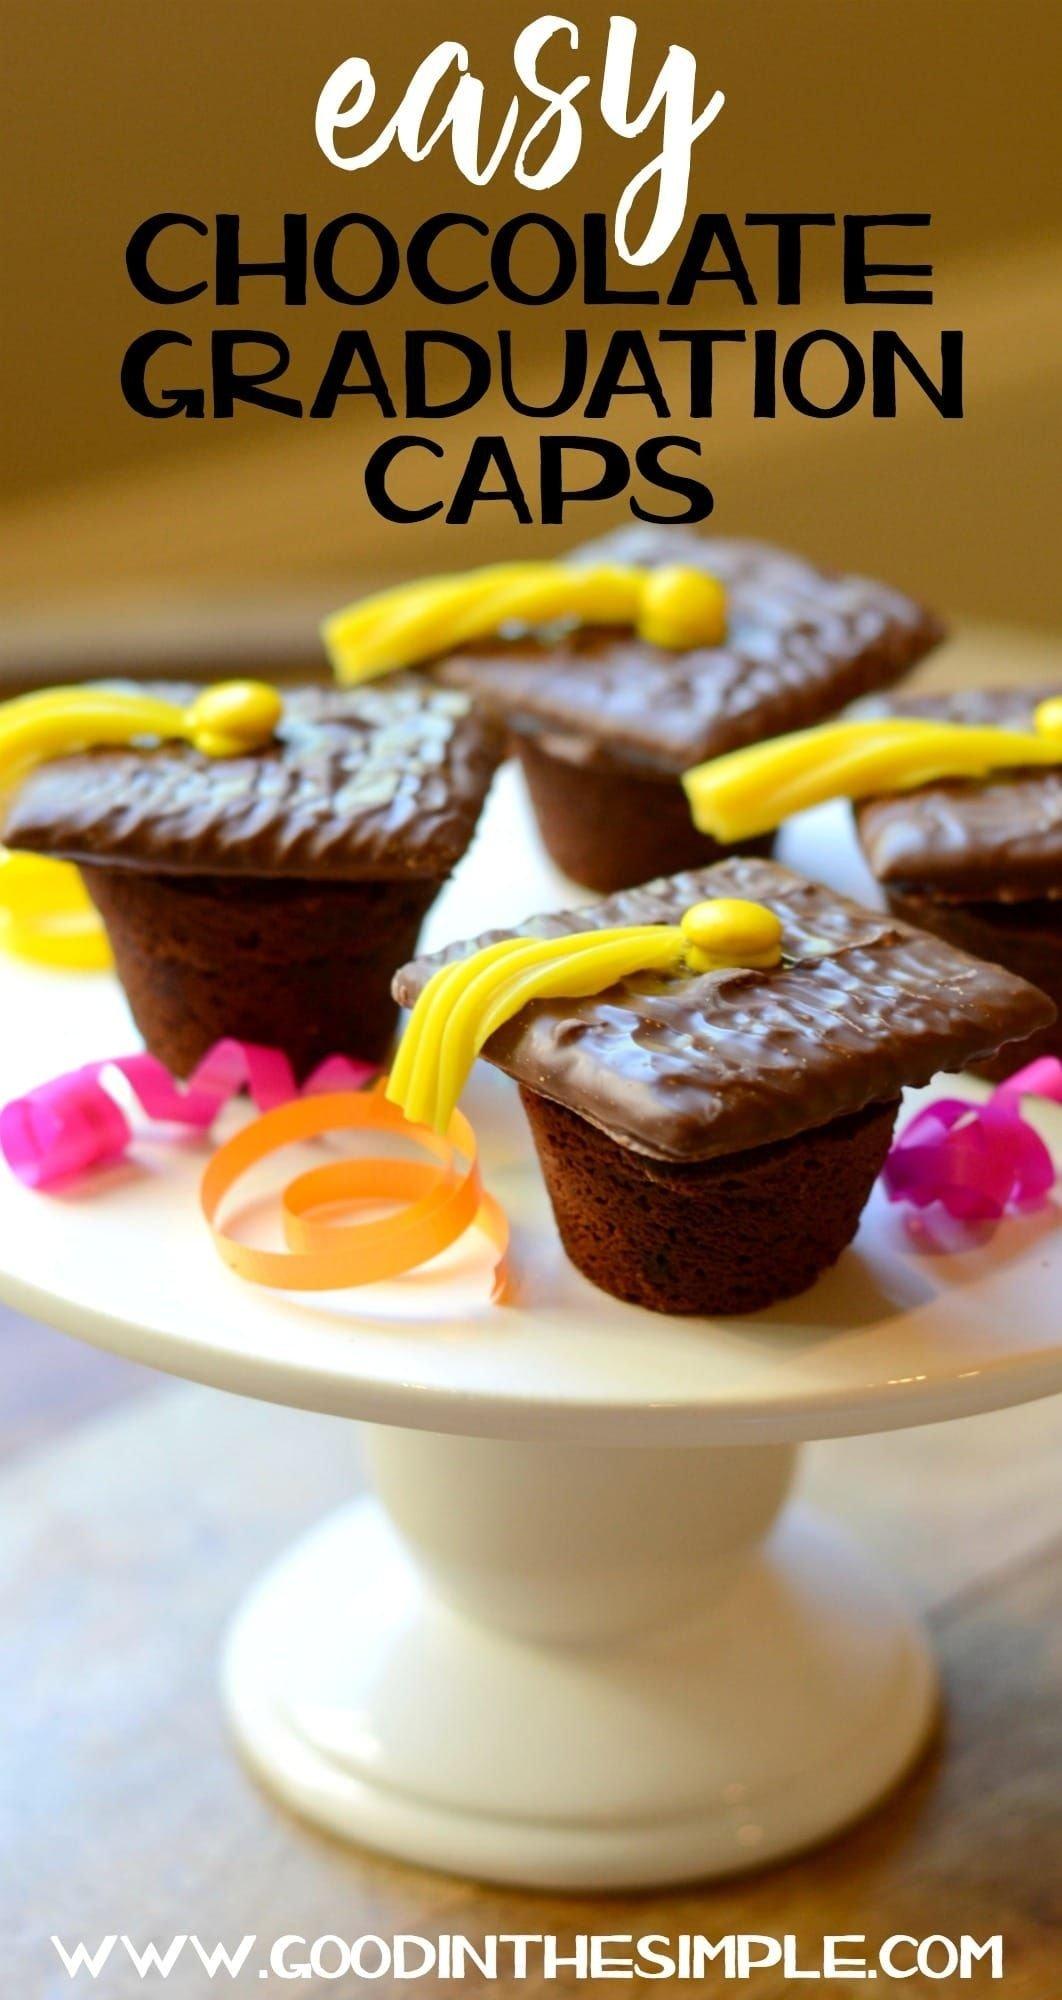 10 Elegant Ideas For Graduation Party Food easy graduation party idea chocolate graduation caps cap 2021